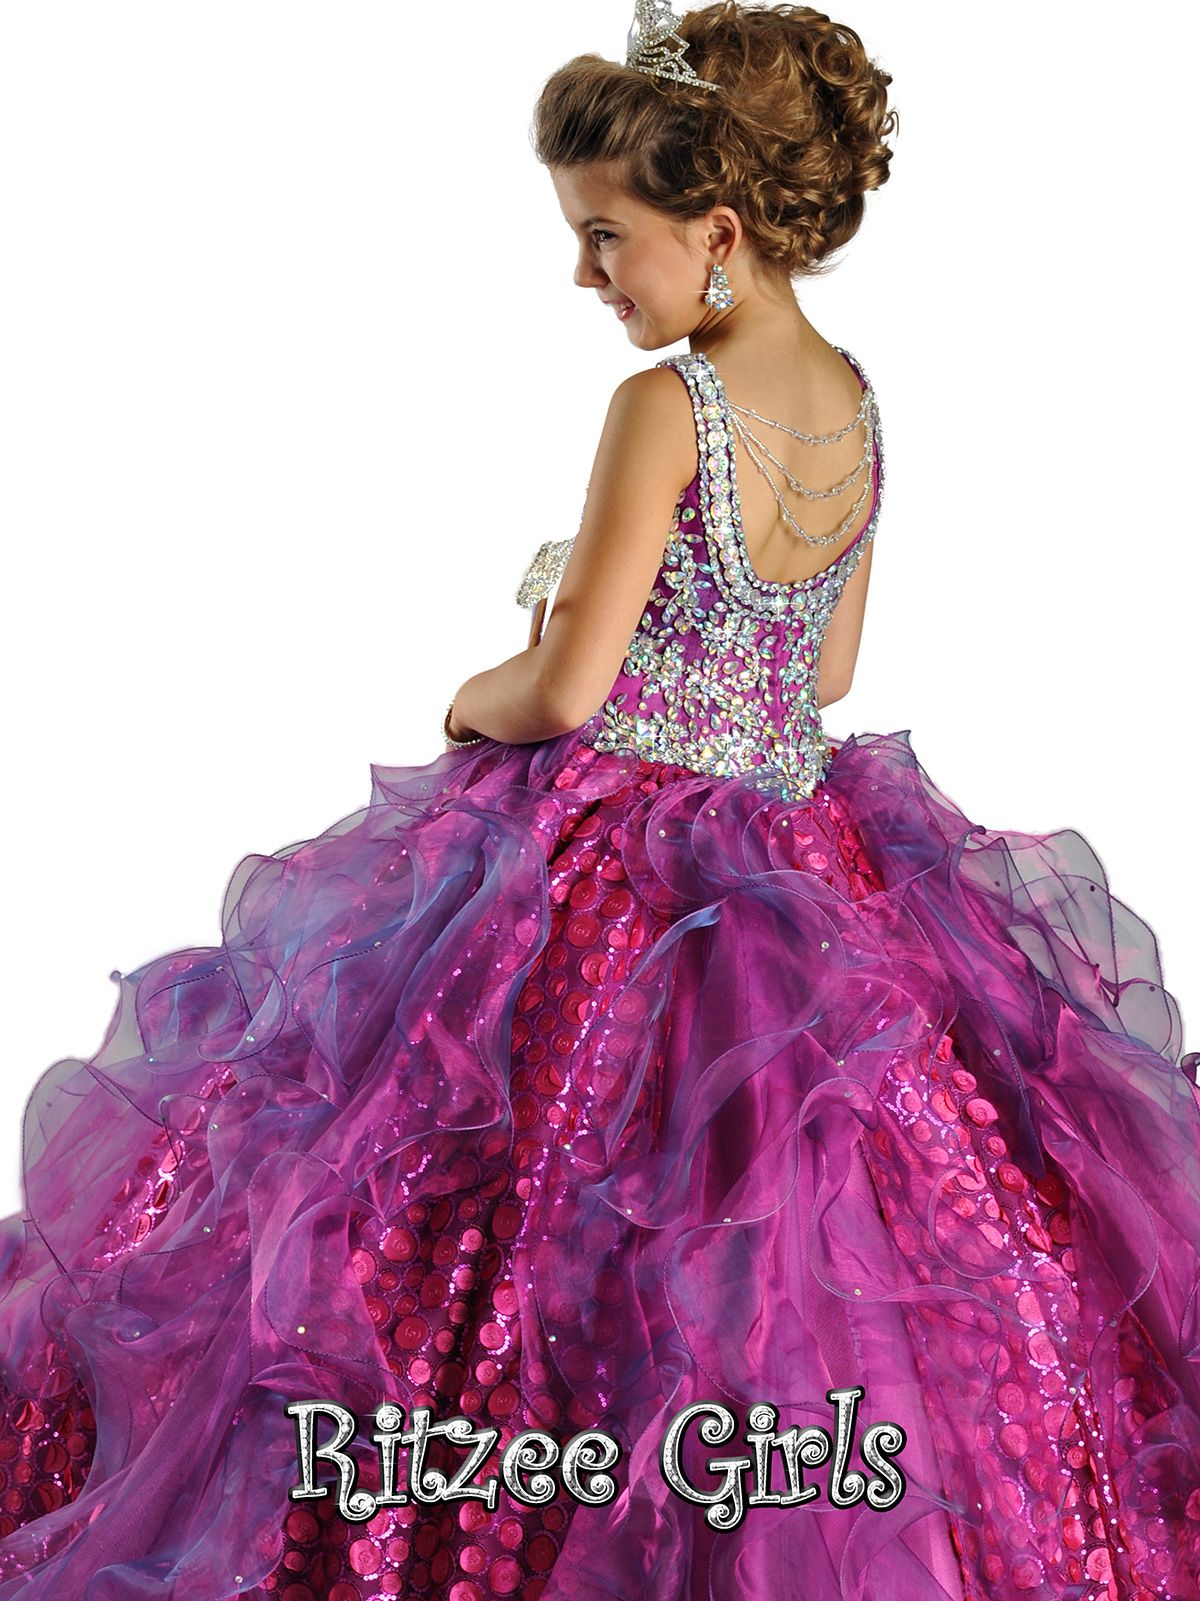 Iridescent Sabrina Neckline Ritzee Girls Pageant Ball Gown 6567 ...